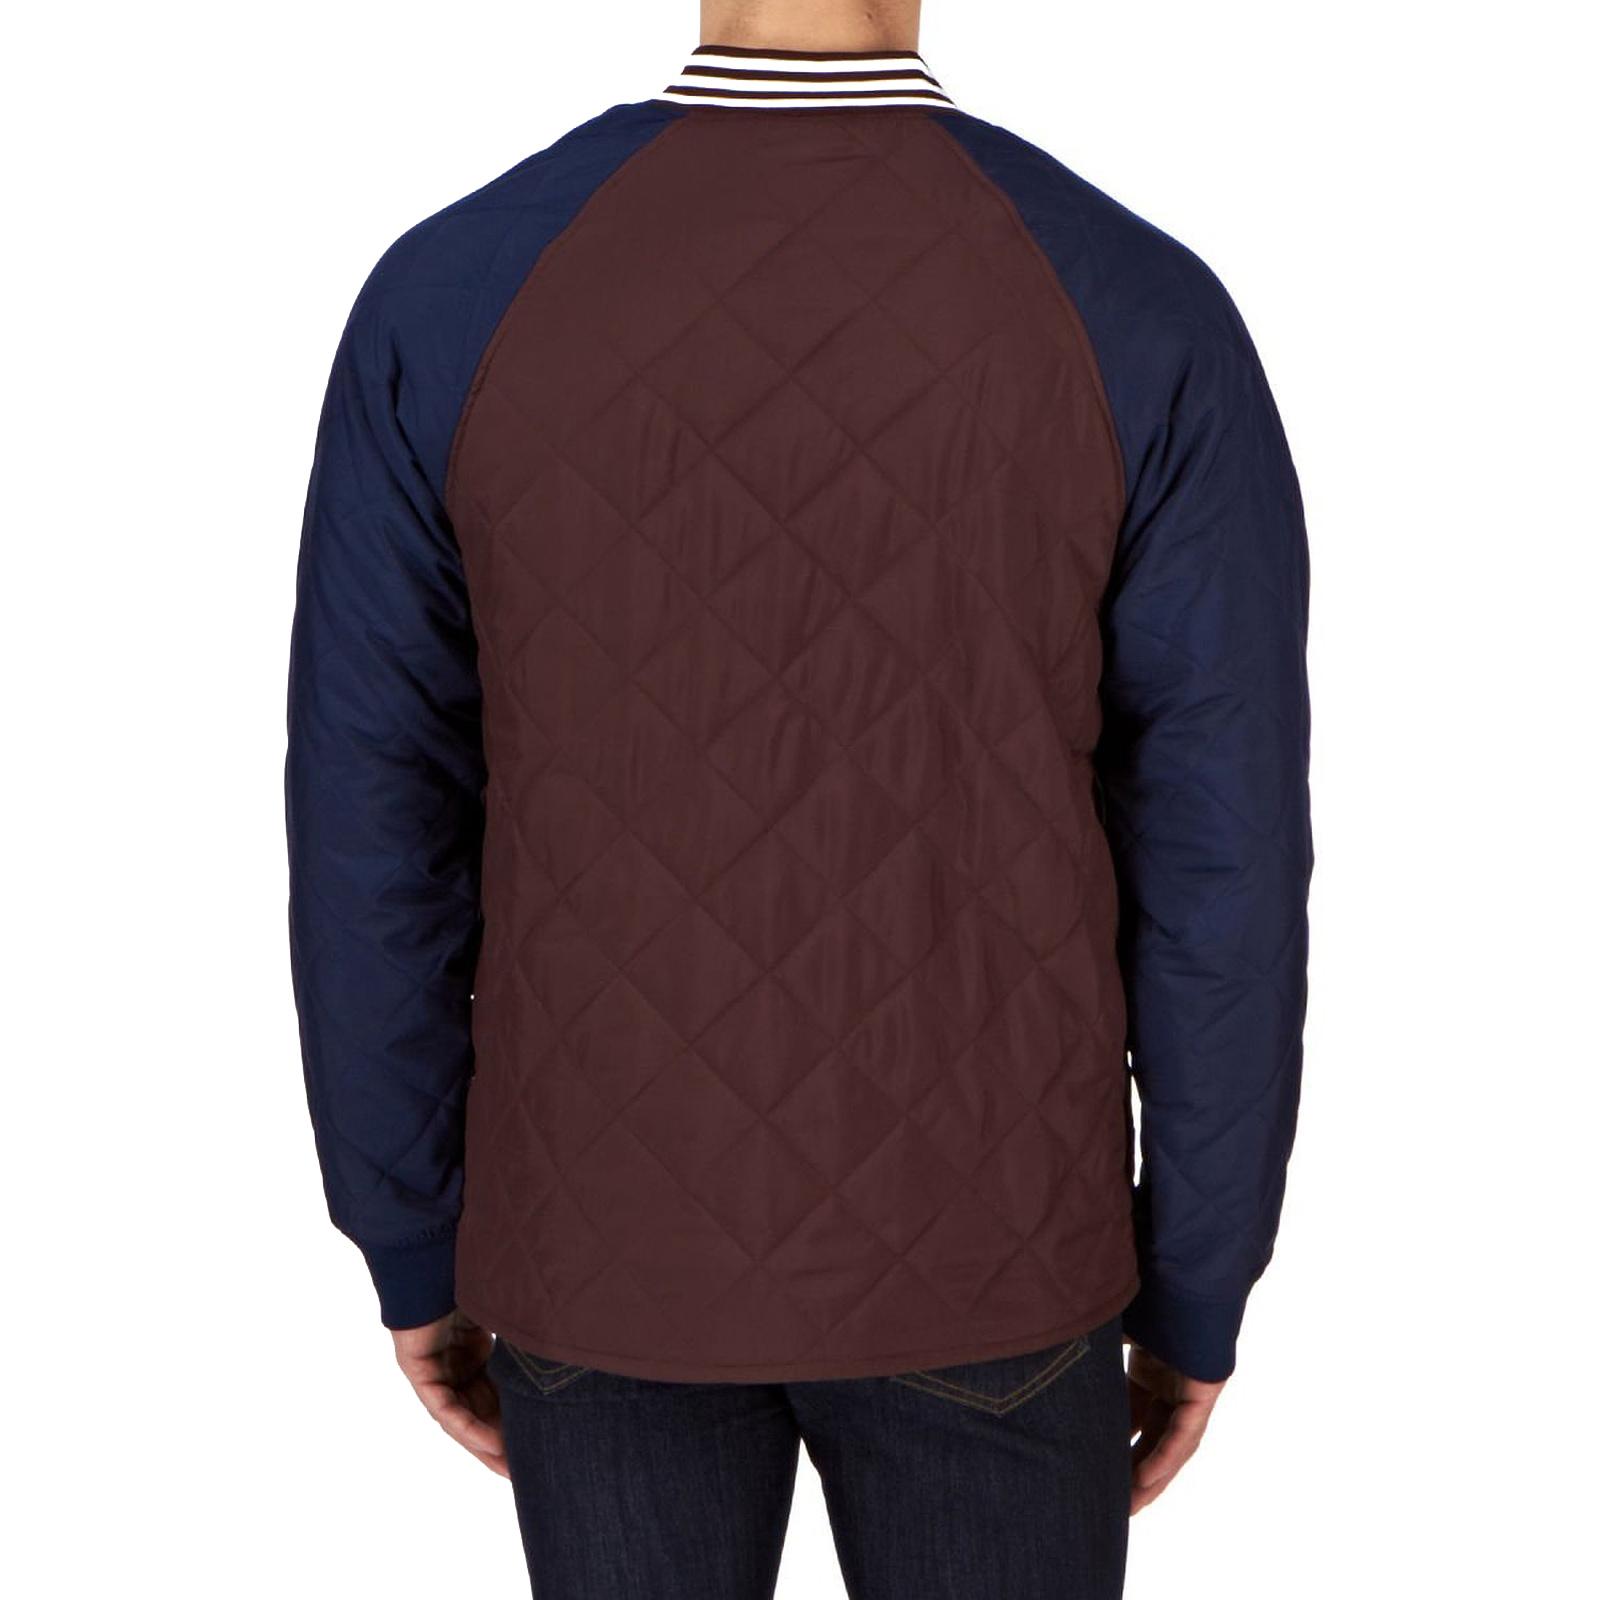 Adidas Originals Mens Pe Superstar Quilted Bomber Jacket